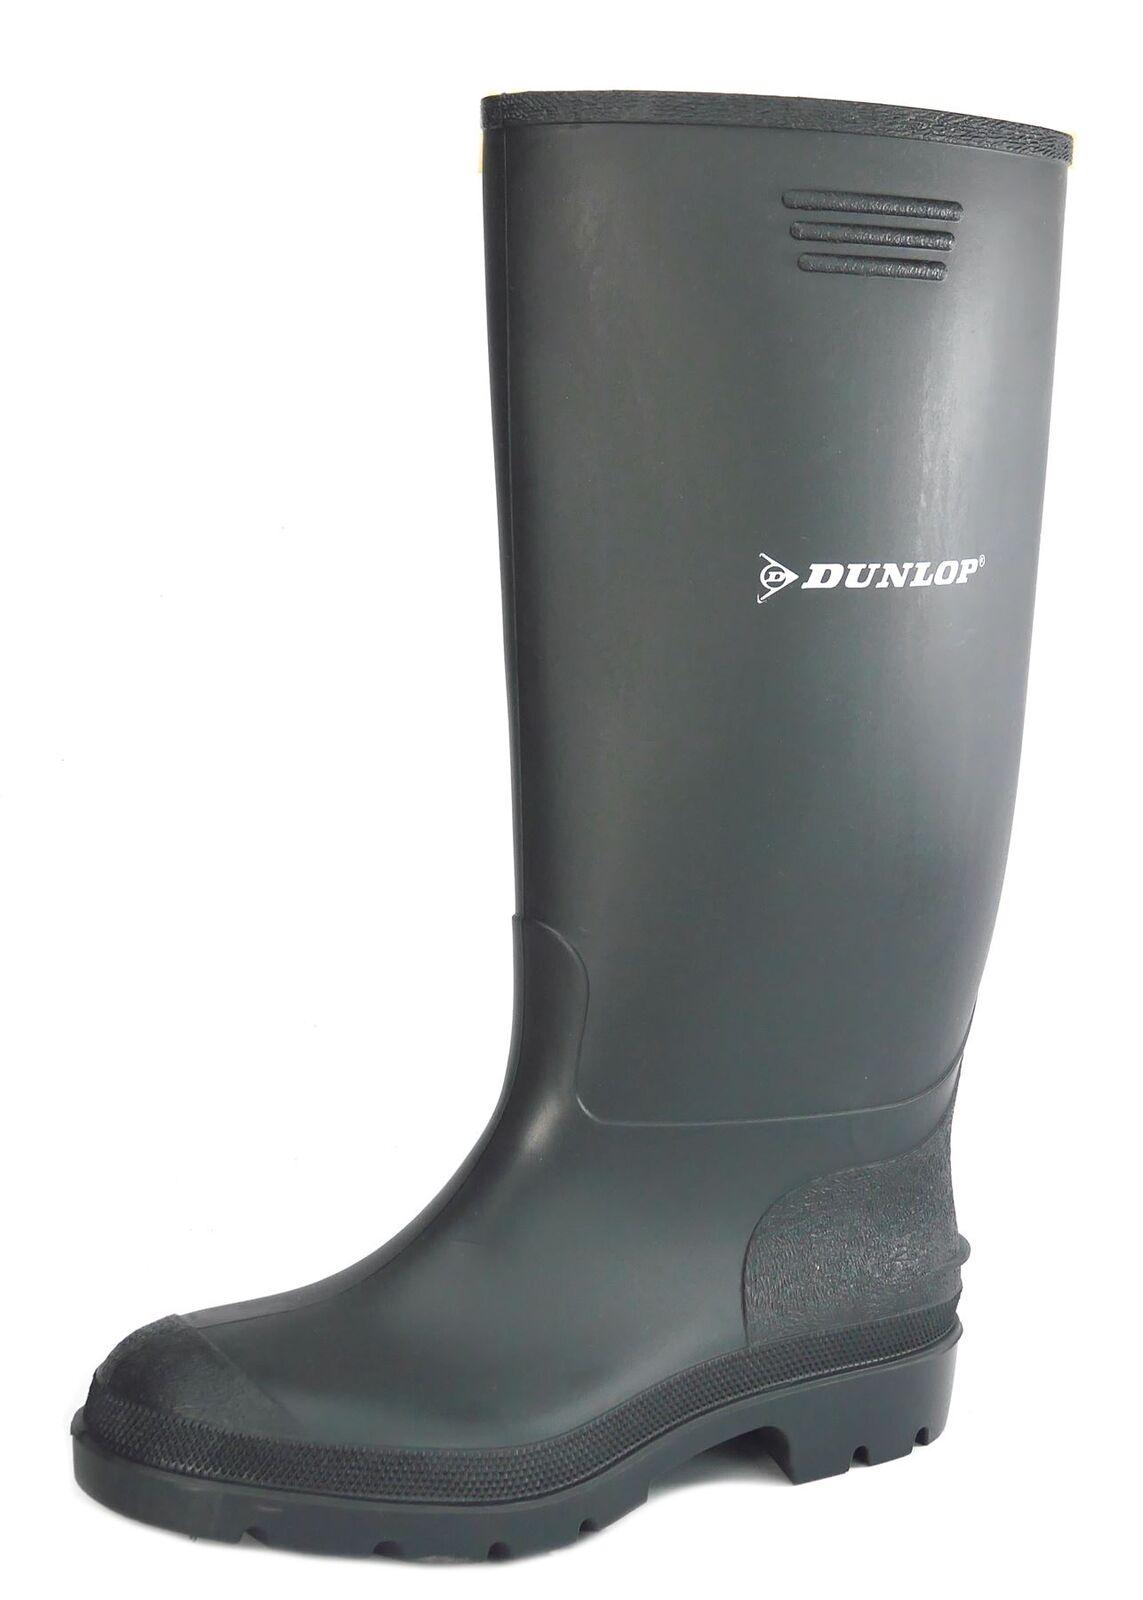 Dunlop Waterproof Pricemaster Mens Wellington Boots Mens Pricemaster Ladies Black 8c1250